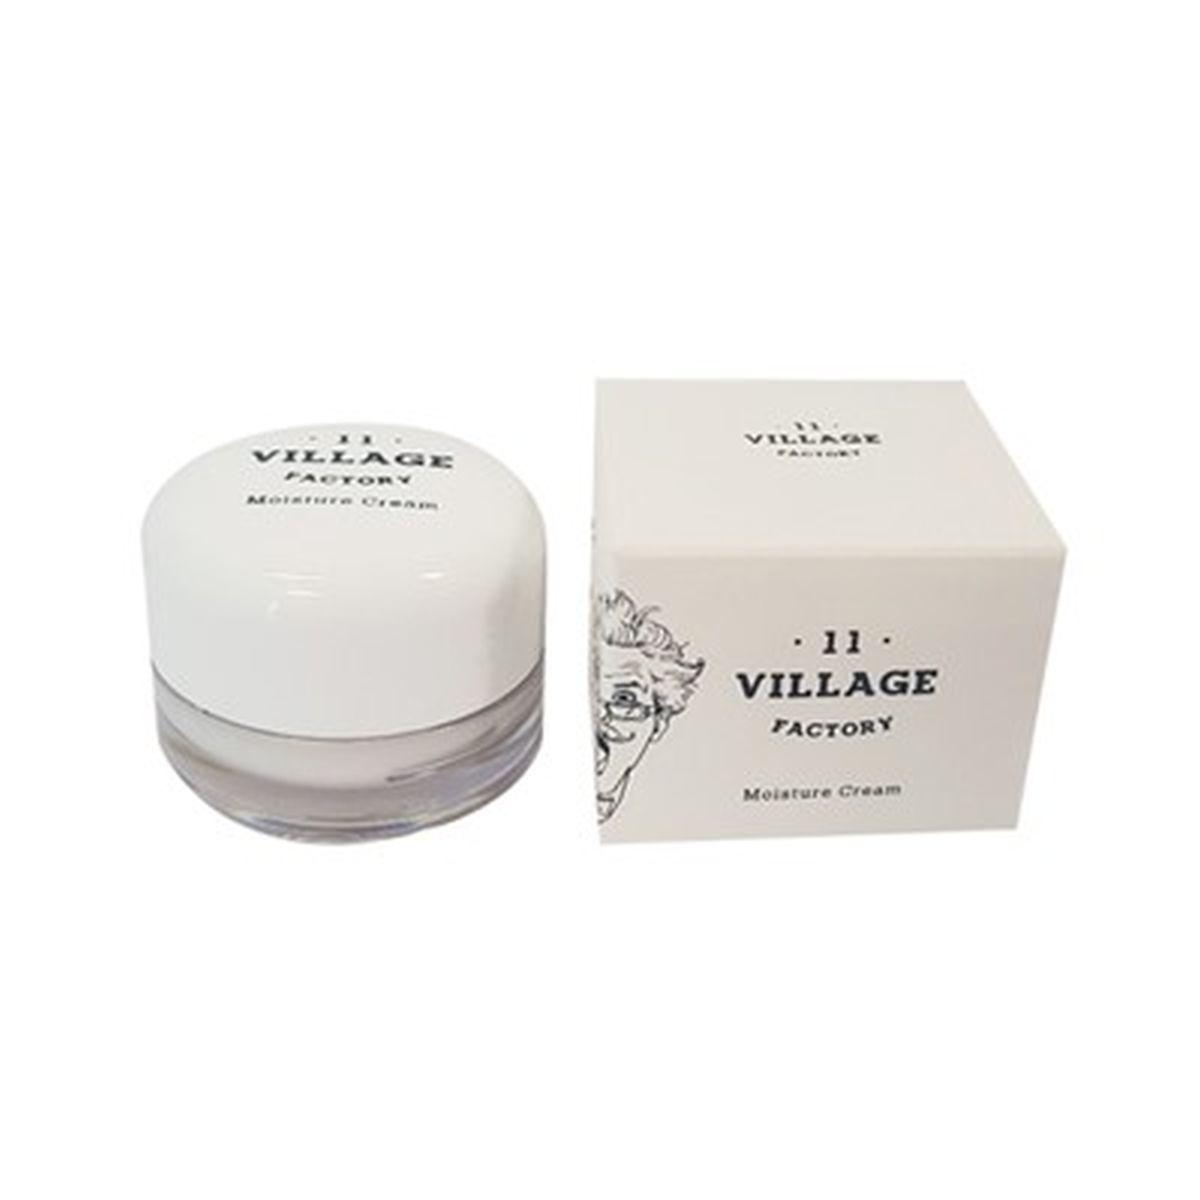 Миниатюра крема для лица Village 11 Factory Moisture Cream - 15 мл